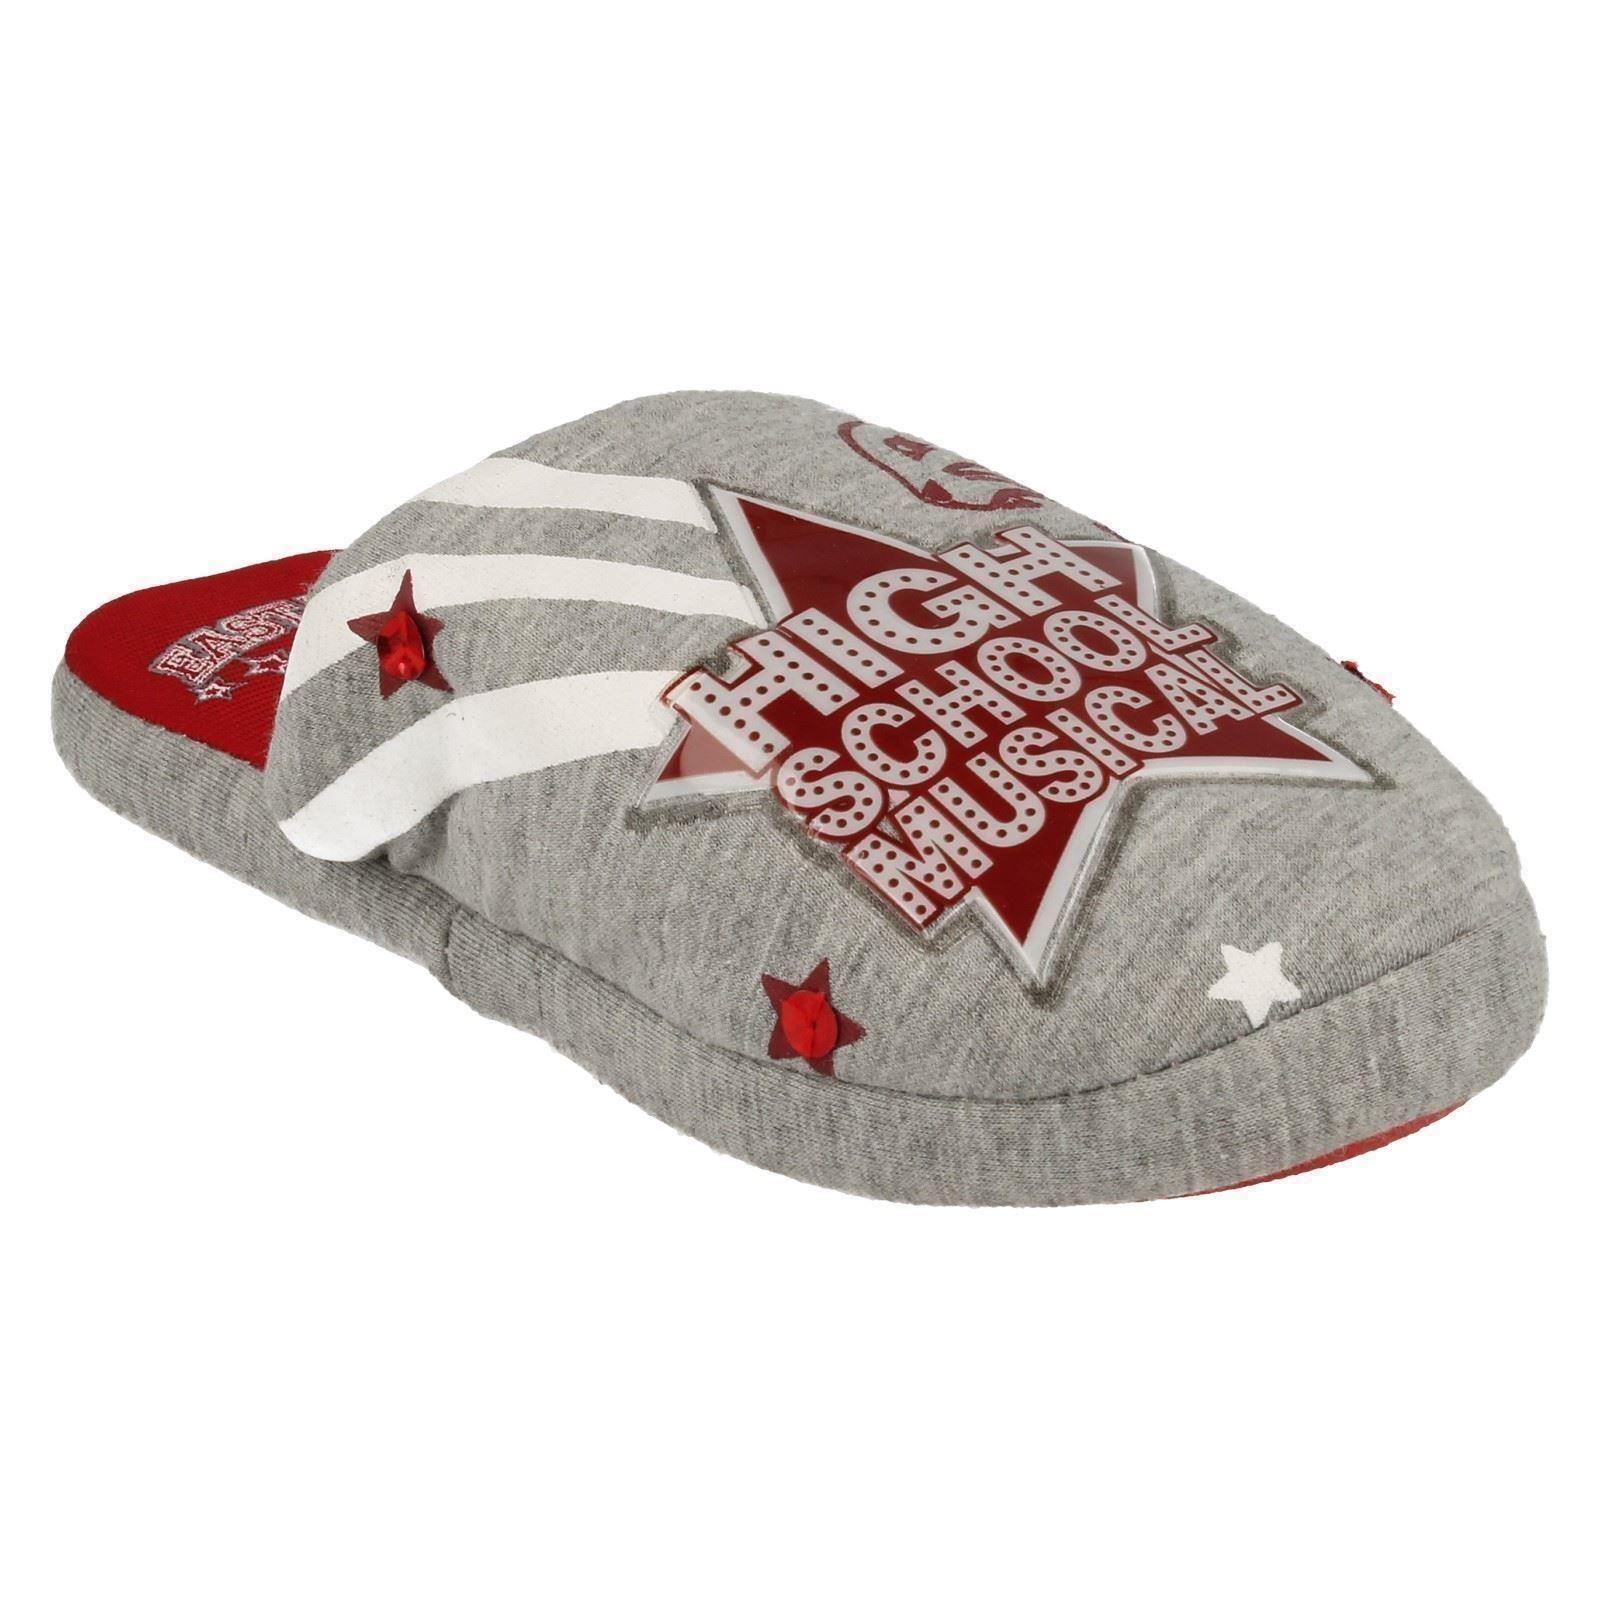 Girls Spot On High School Musical Mule Slippers